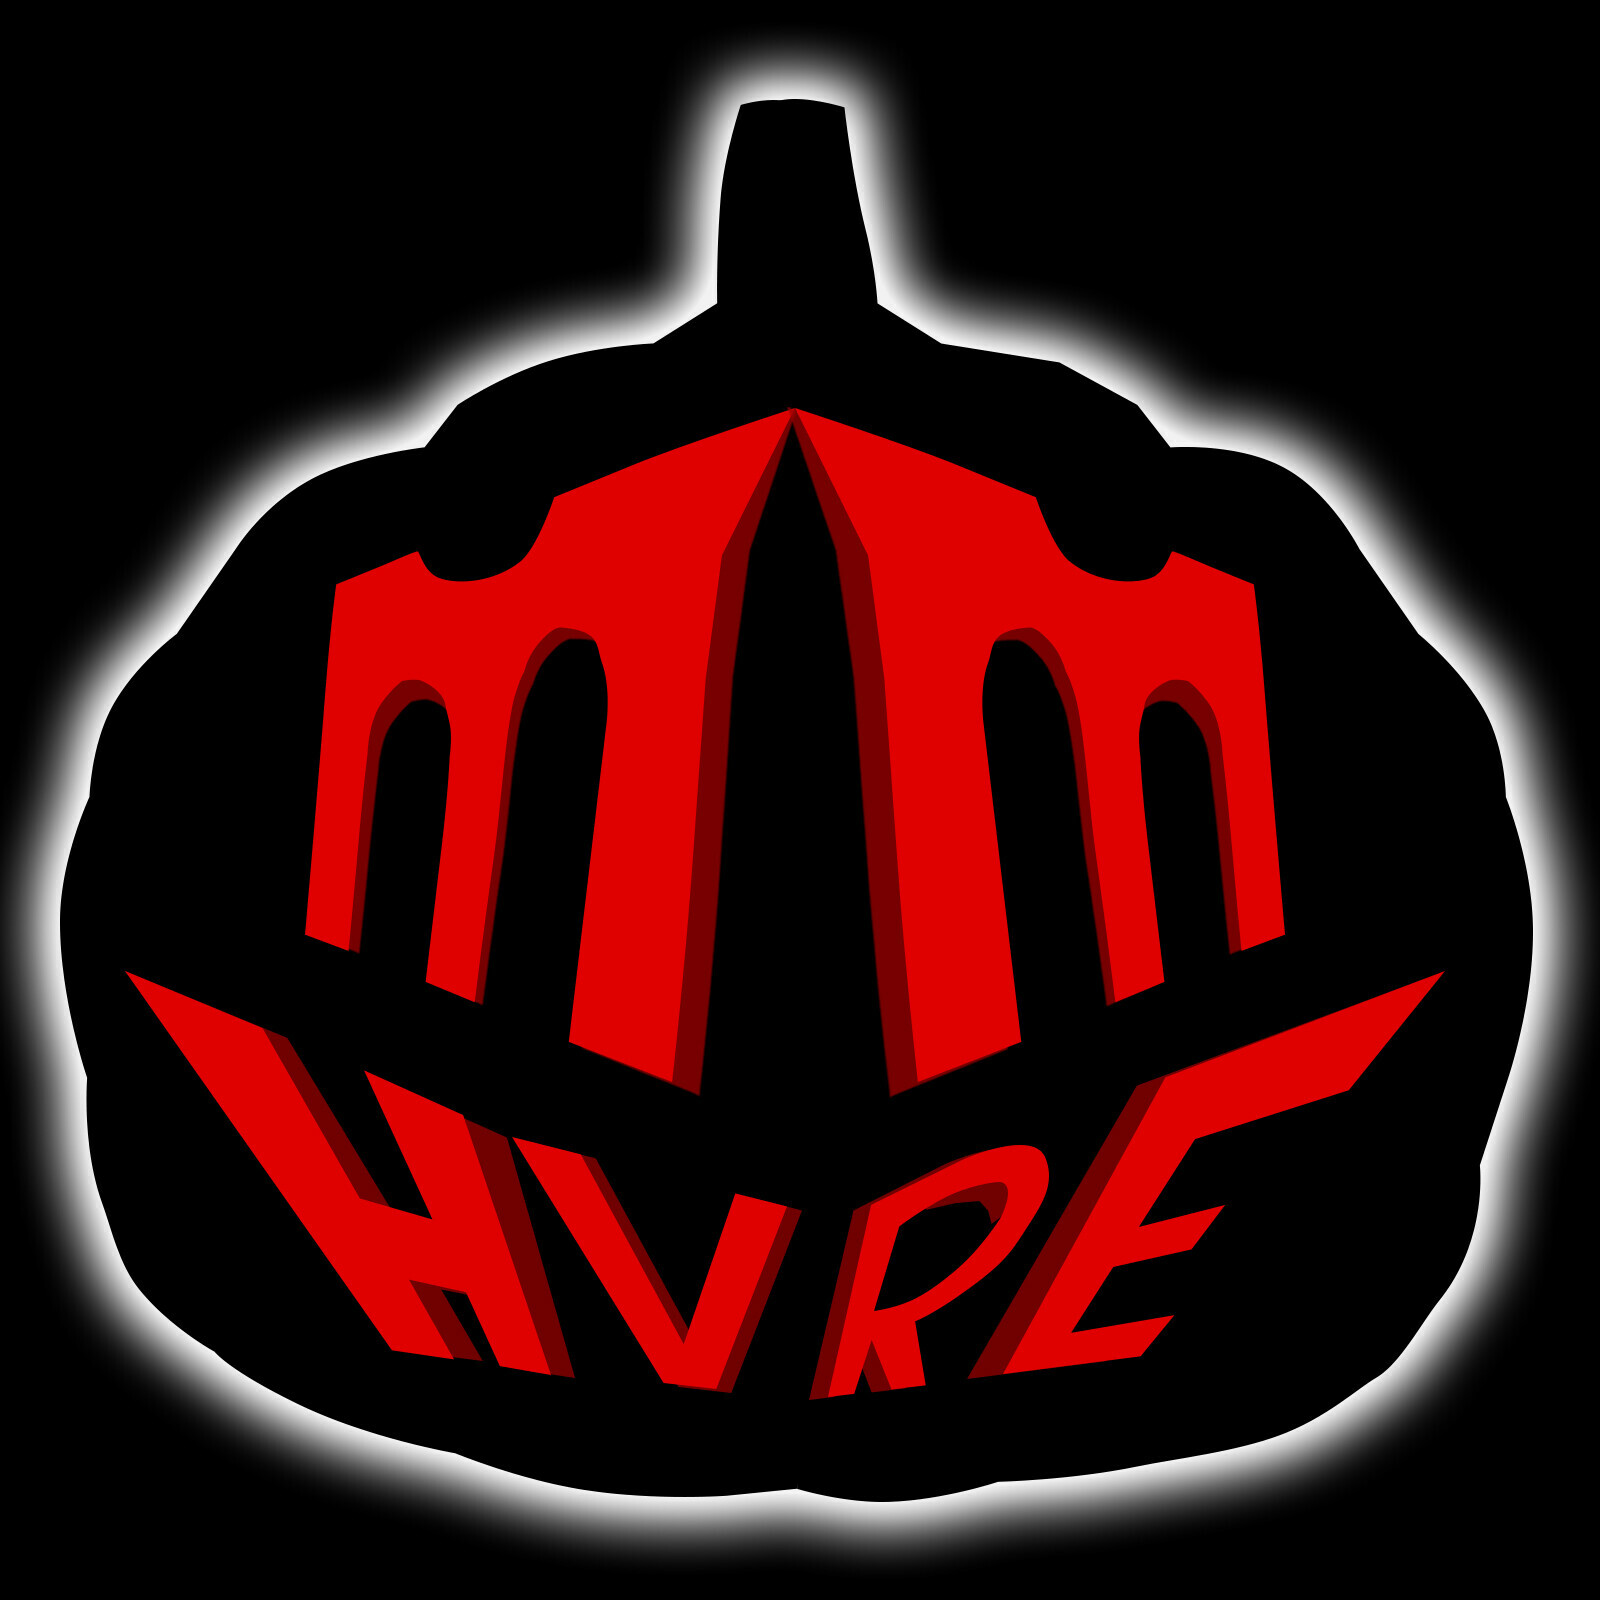 Icon used for HVRE's Mortimer's Mansion